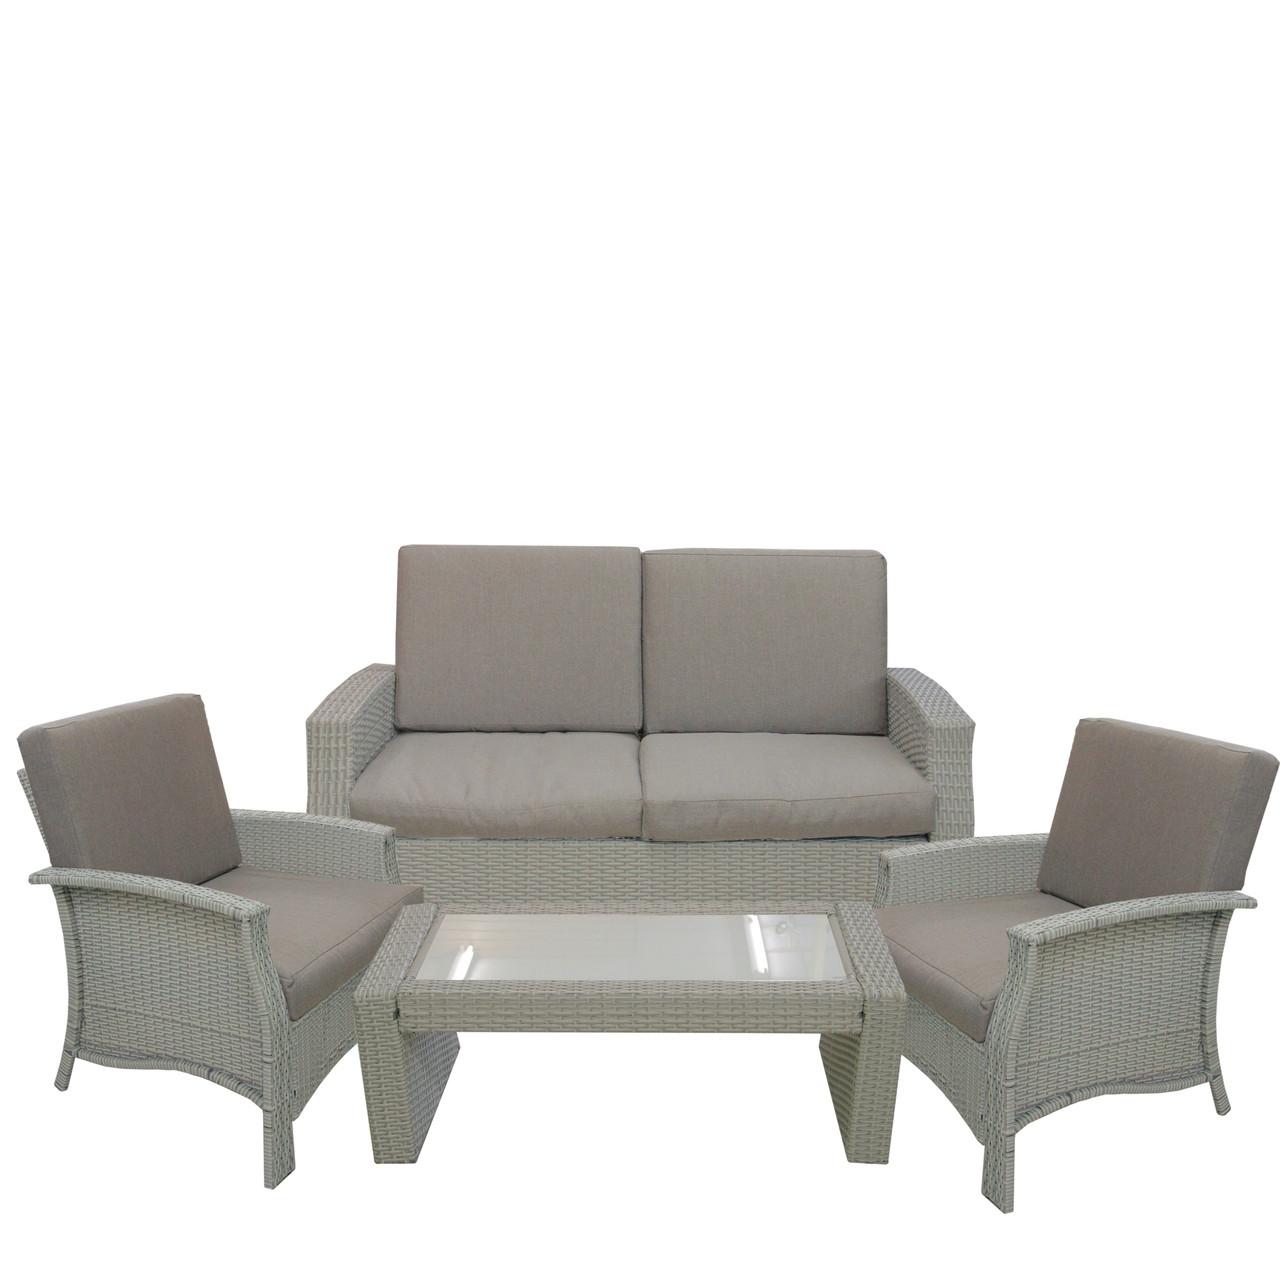 4pc gray wicker outdoor patio furniture set 57 75